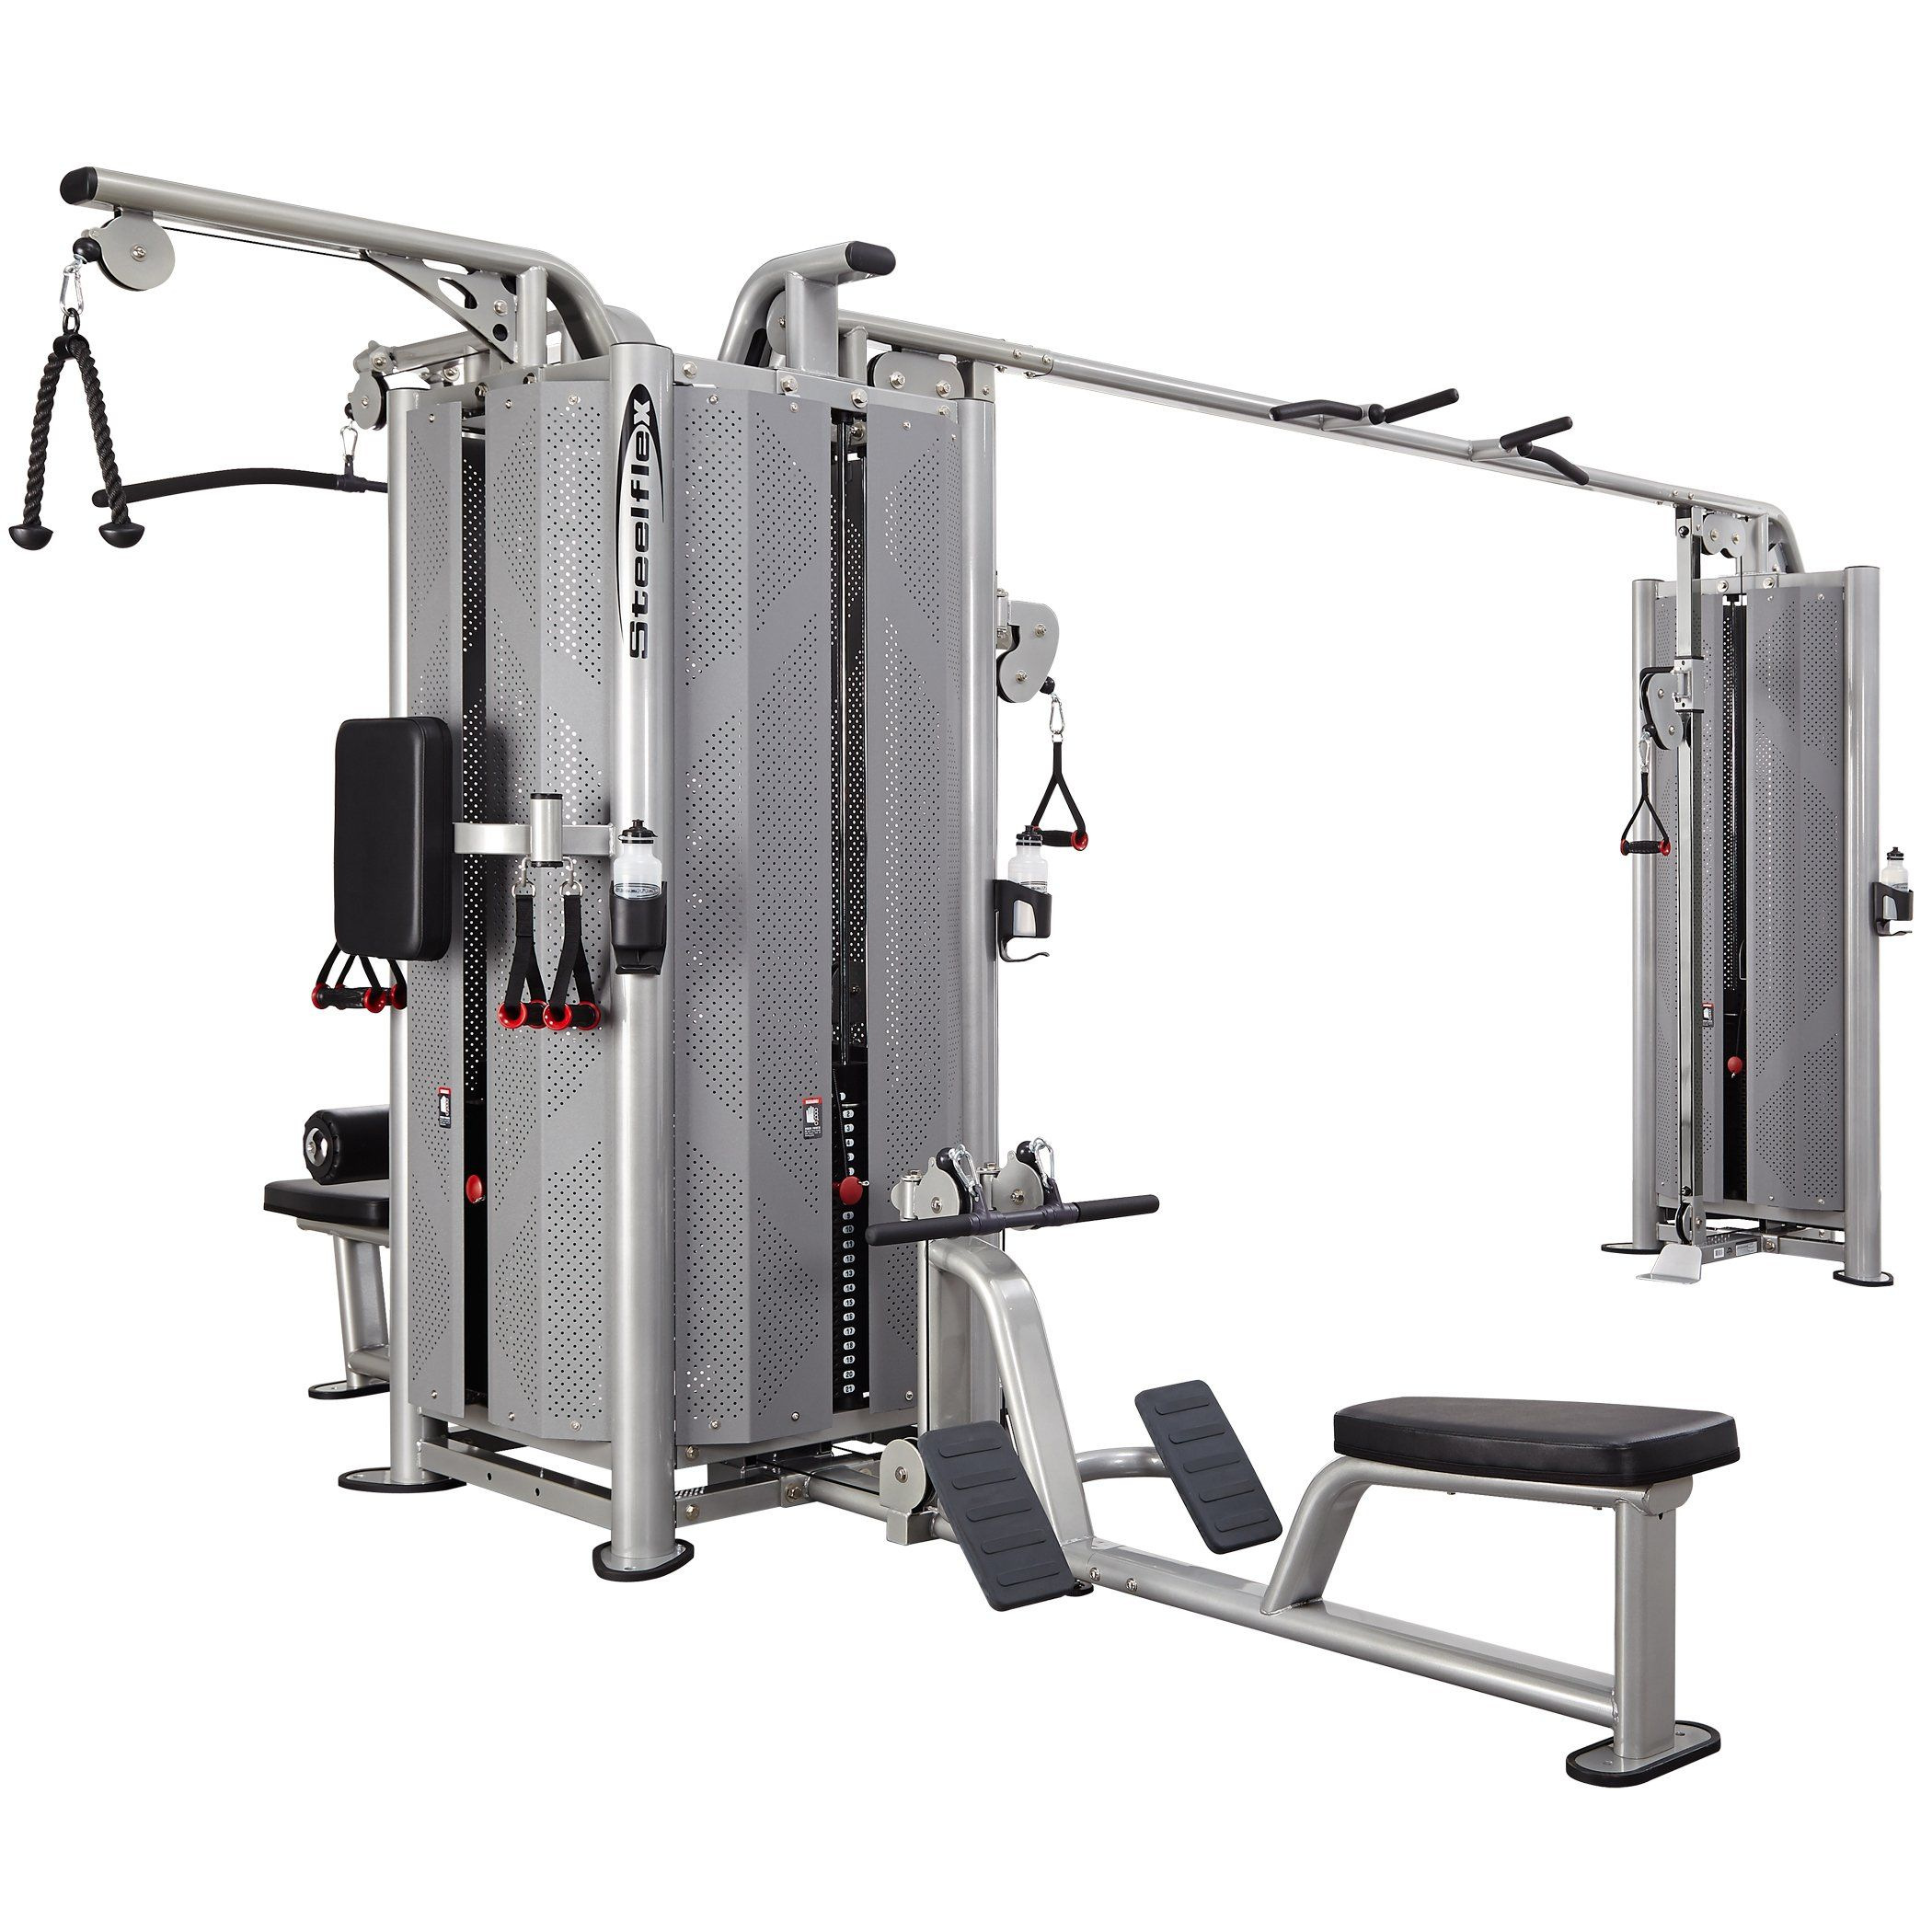 Jg5000s Steelflex Jungle Gyms Fitness Gym Fit Health Ohiofitnessgarage Fittnessequipment Workout Gymequipment At Home Gym No Equipment Workout Gym